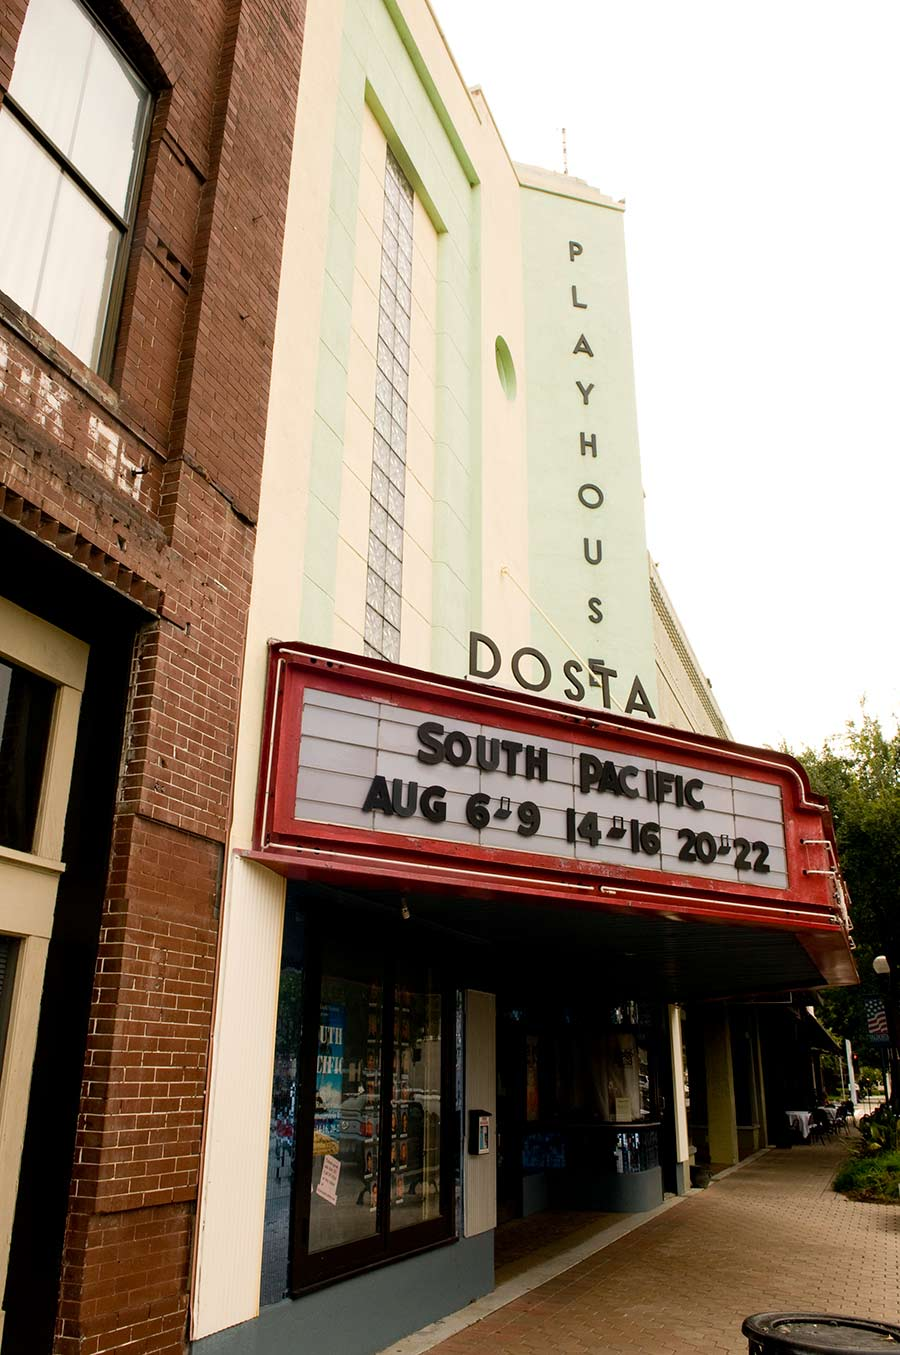 c31254d4c818db Visit the historic Dosta Playhouse in Valdosta